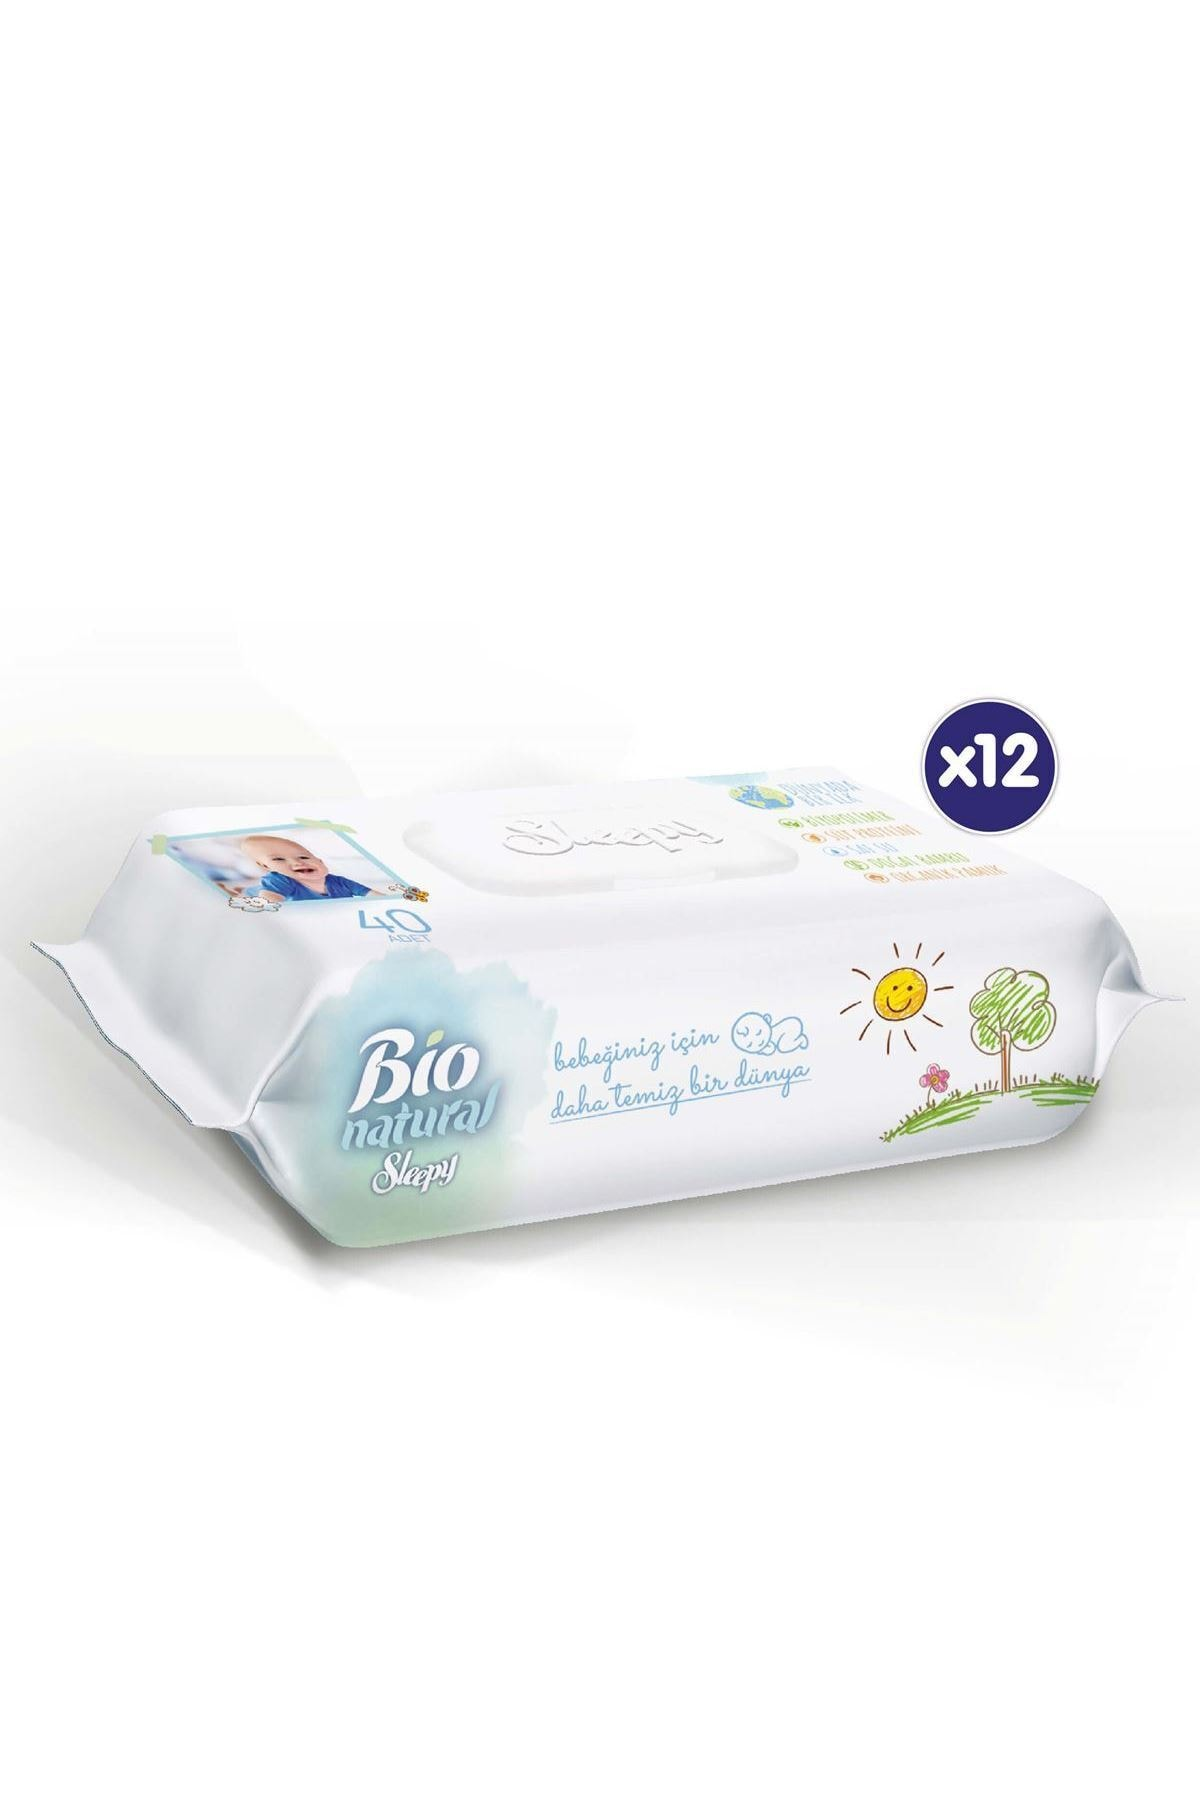 Sleepy Bio Natural Islak Havlu 12x40 (480 Yaprak) 2